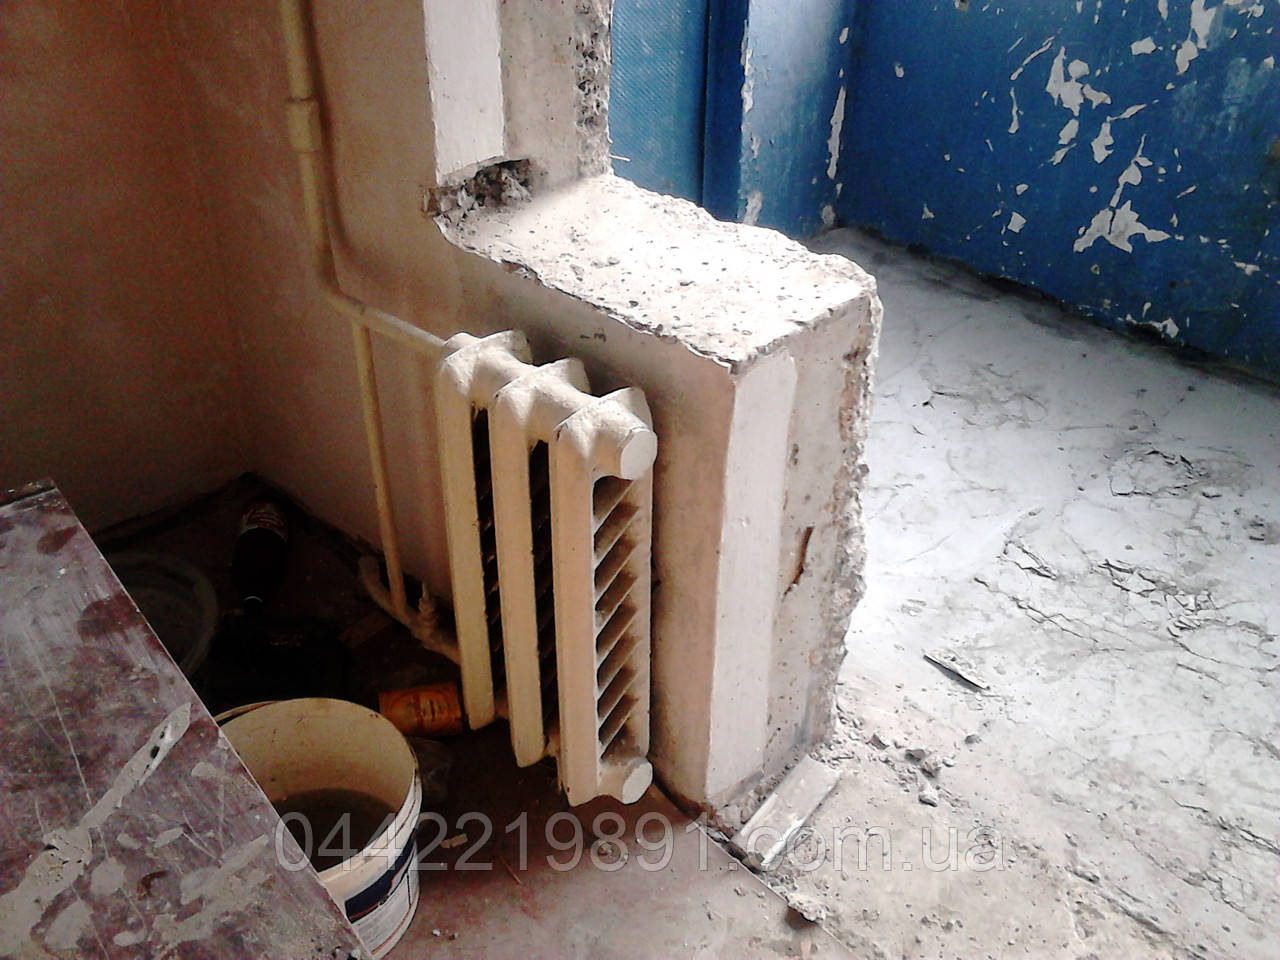 Демонтаж балконной тумбы, снос балконных тумб